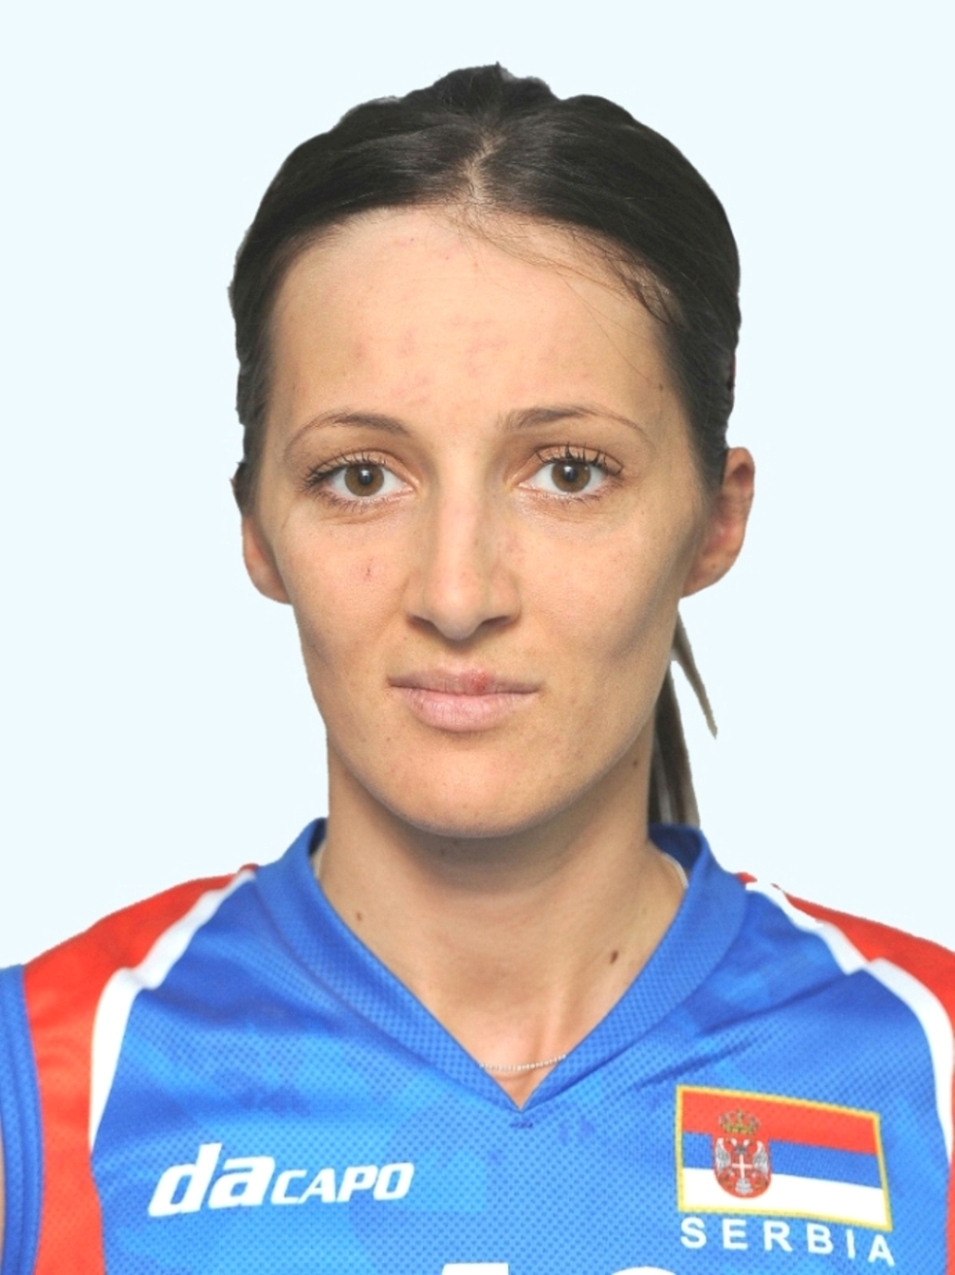 Maja Ognjenovic